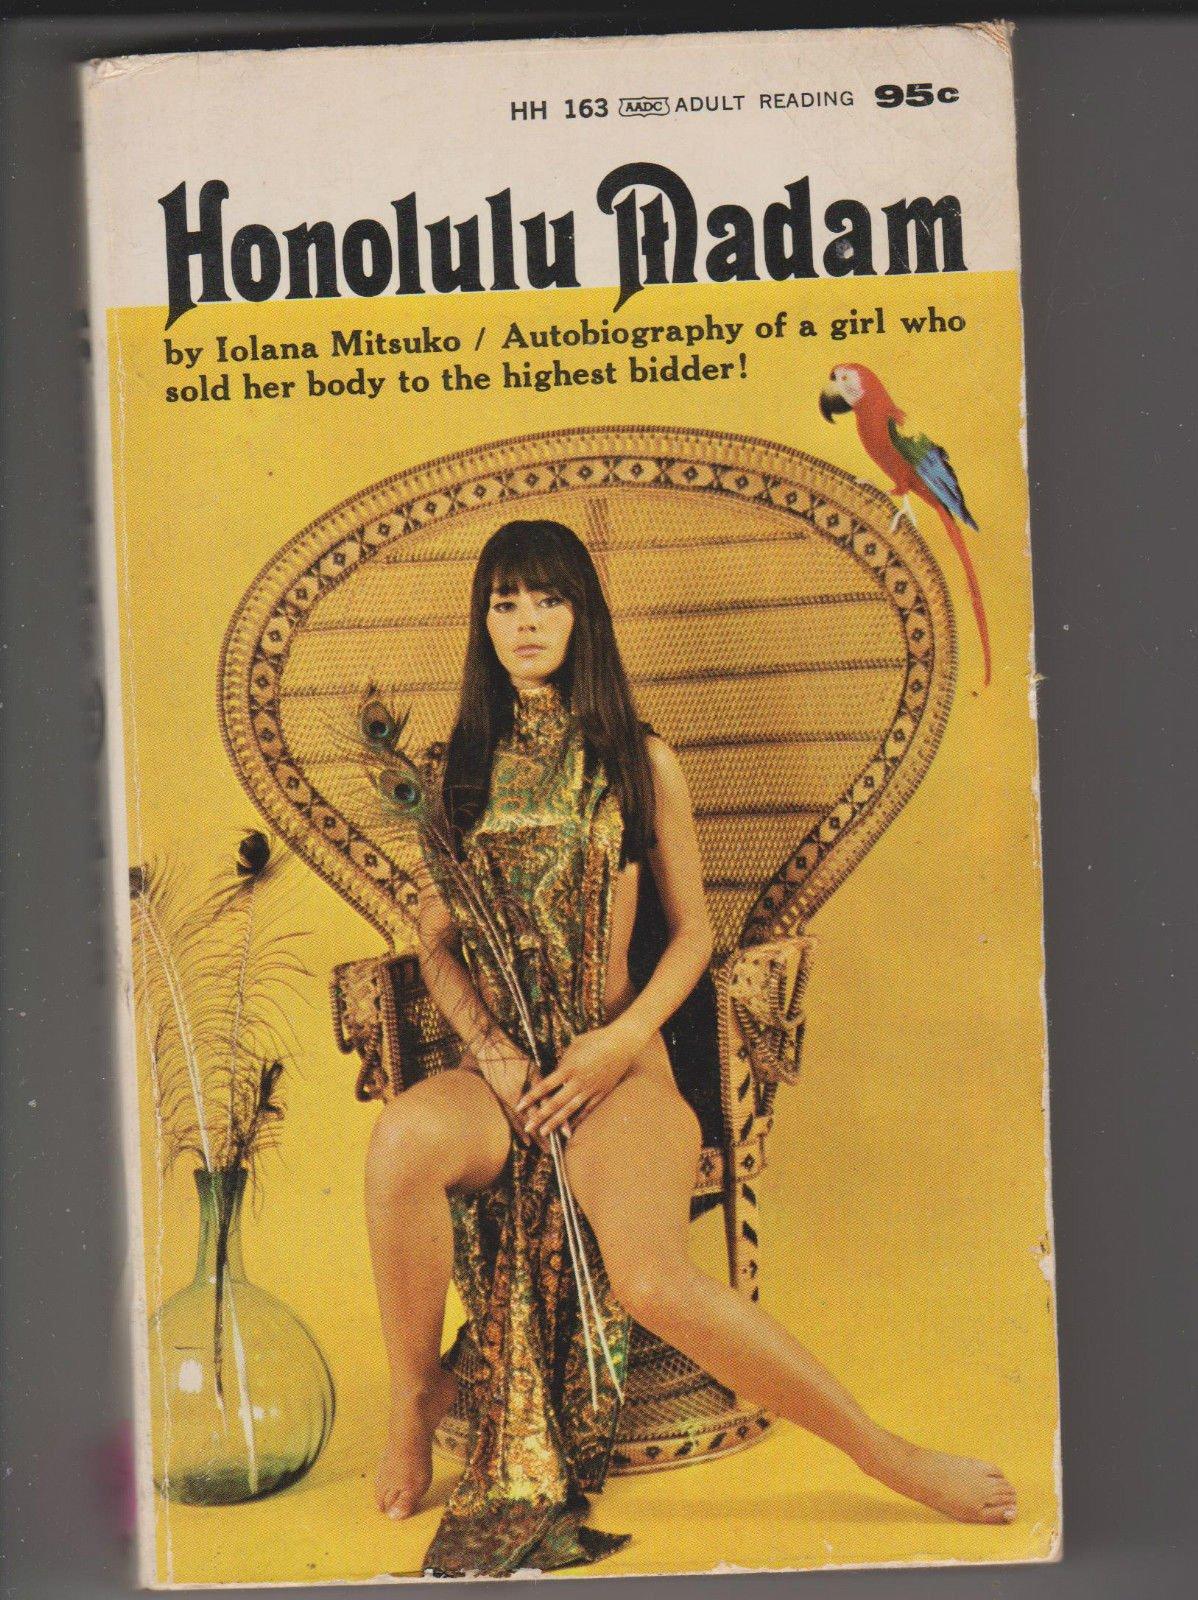 Call girl Honolulu